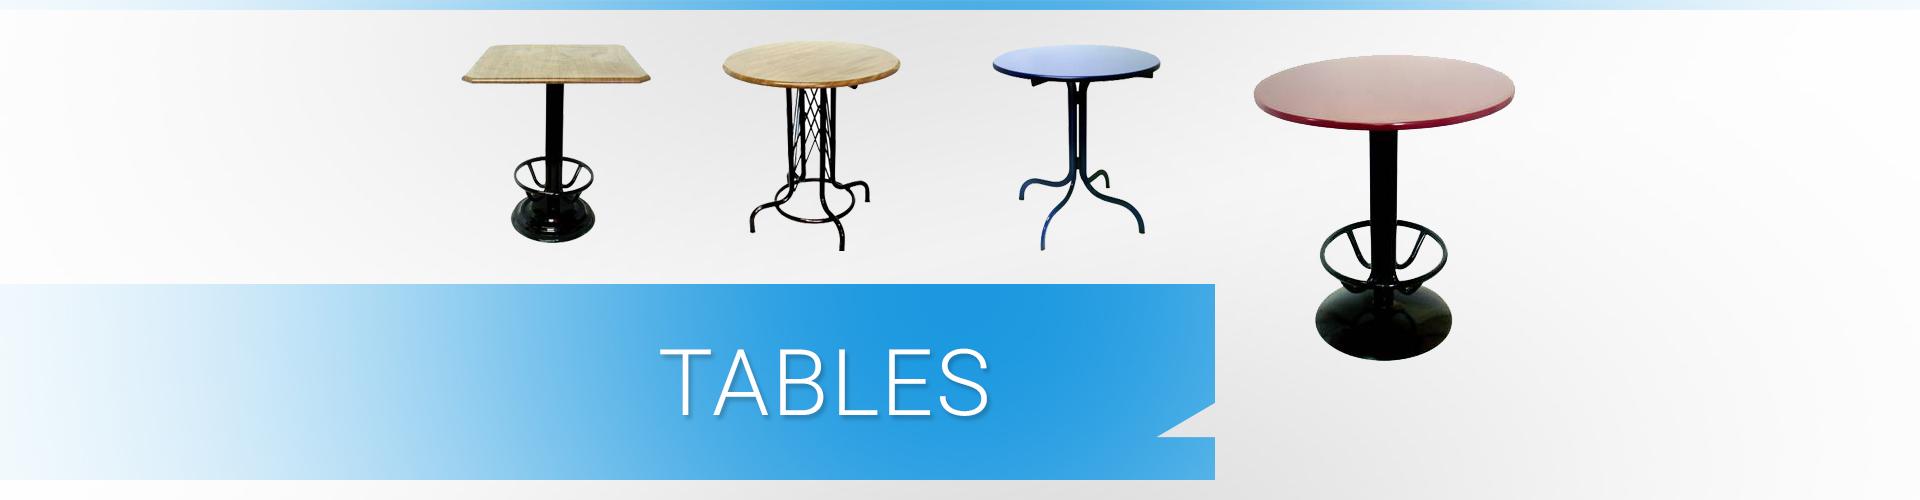 tables_en